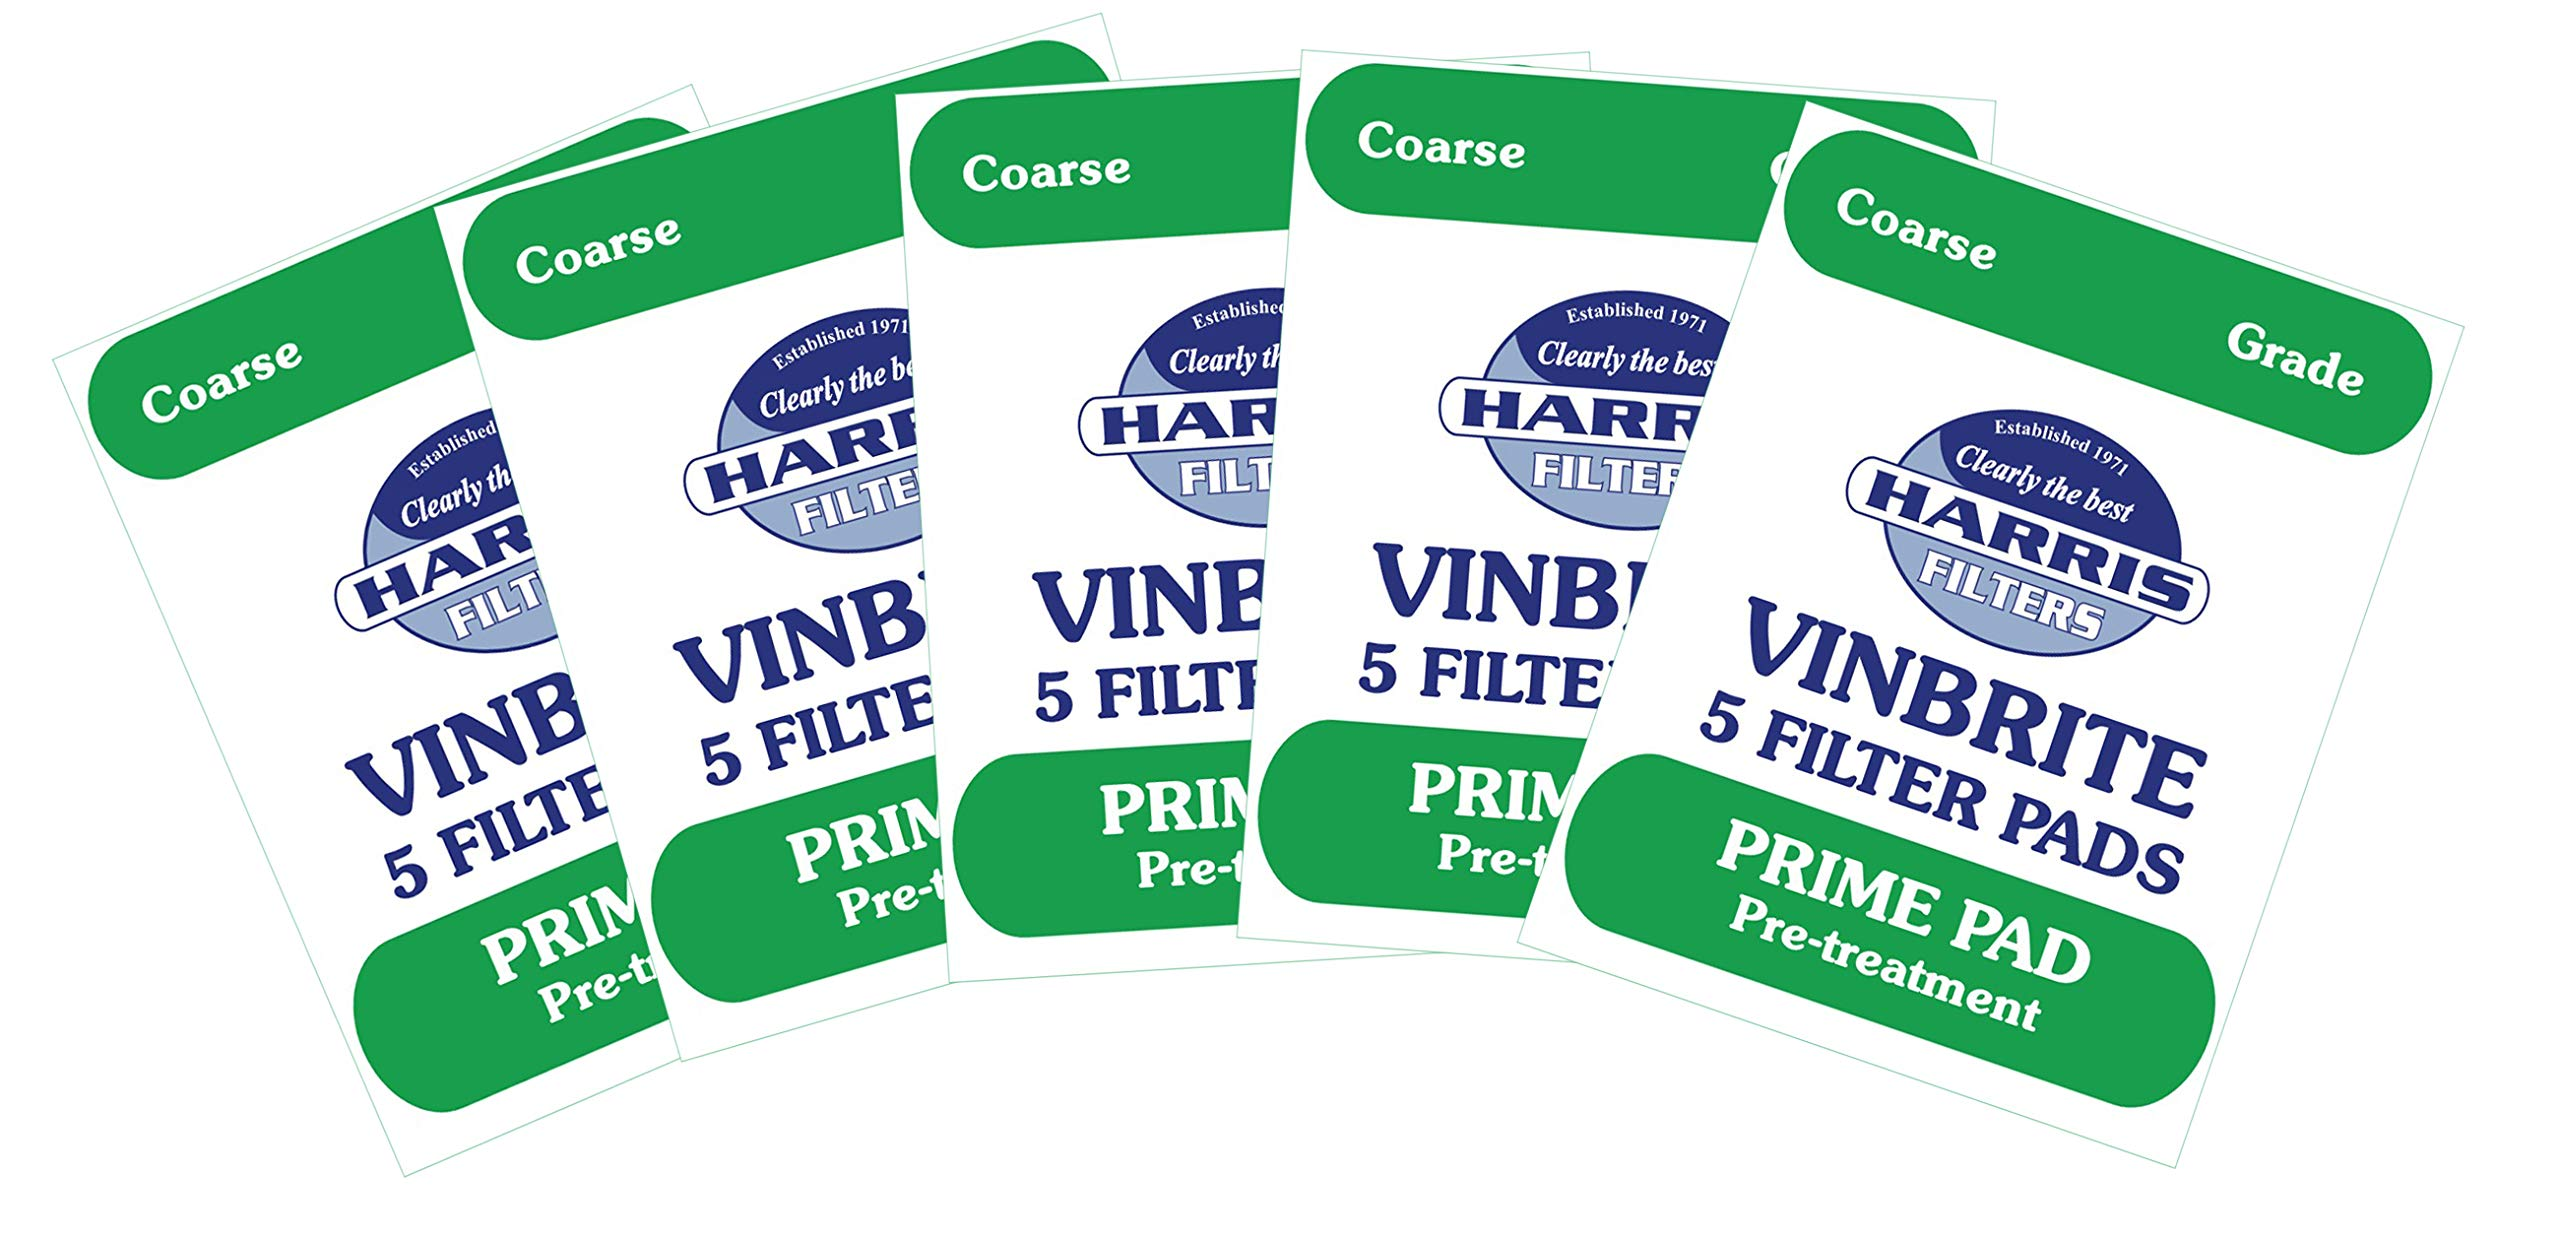 Harris Prime Pre-Filter Pads 5-pack Use with Harris Vinbrite MK3 Filter Kit by Harris